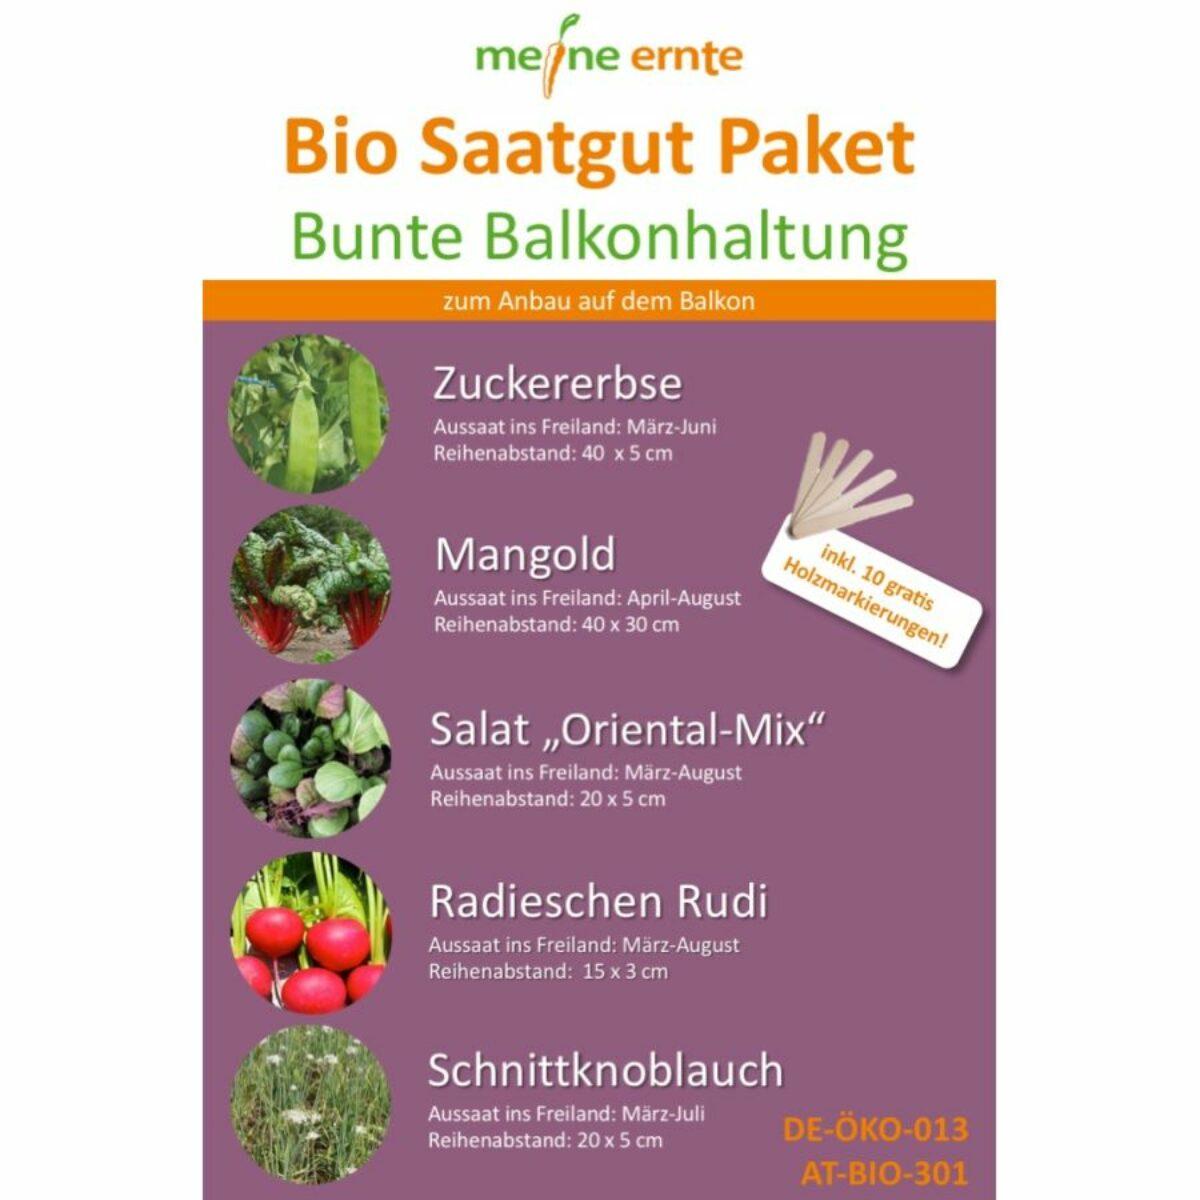 Bio Saatgut Paket Bunte Balkonhaltung incl. 8 gratis Holzmarkierungen